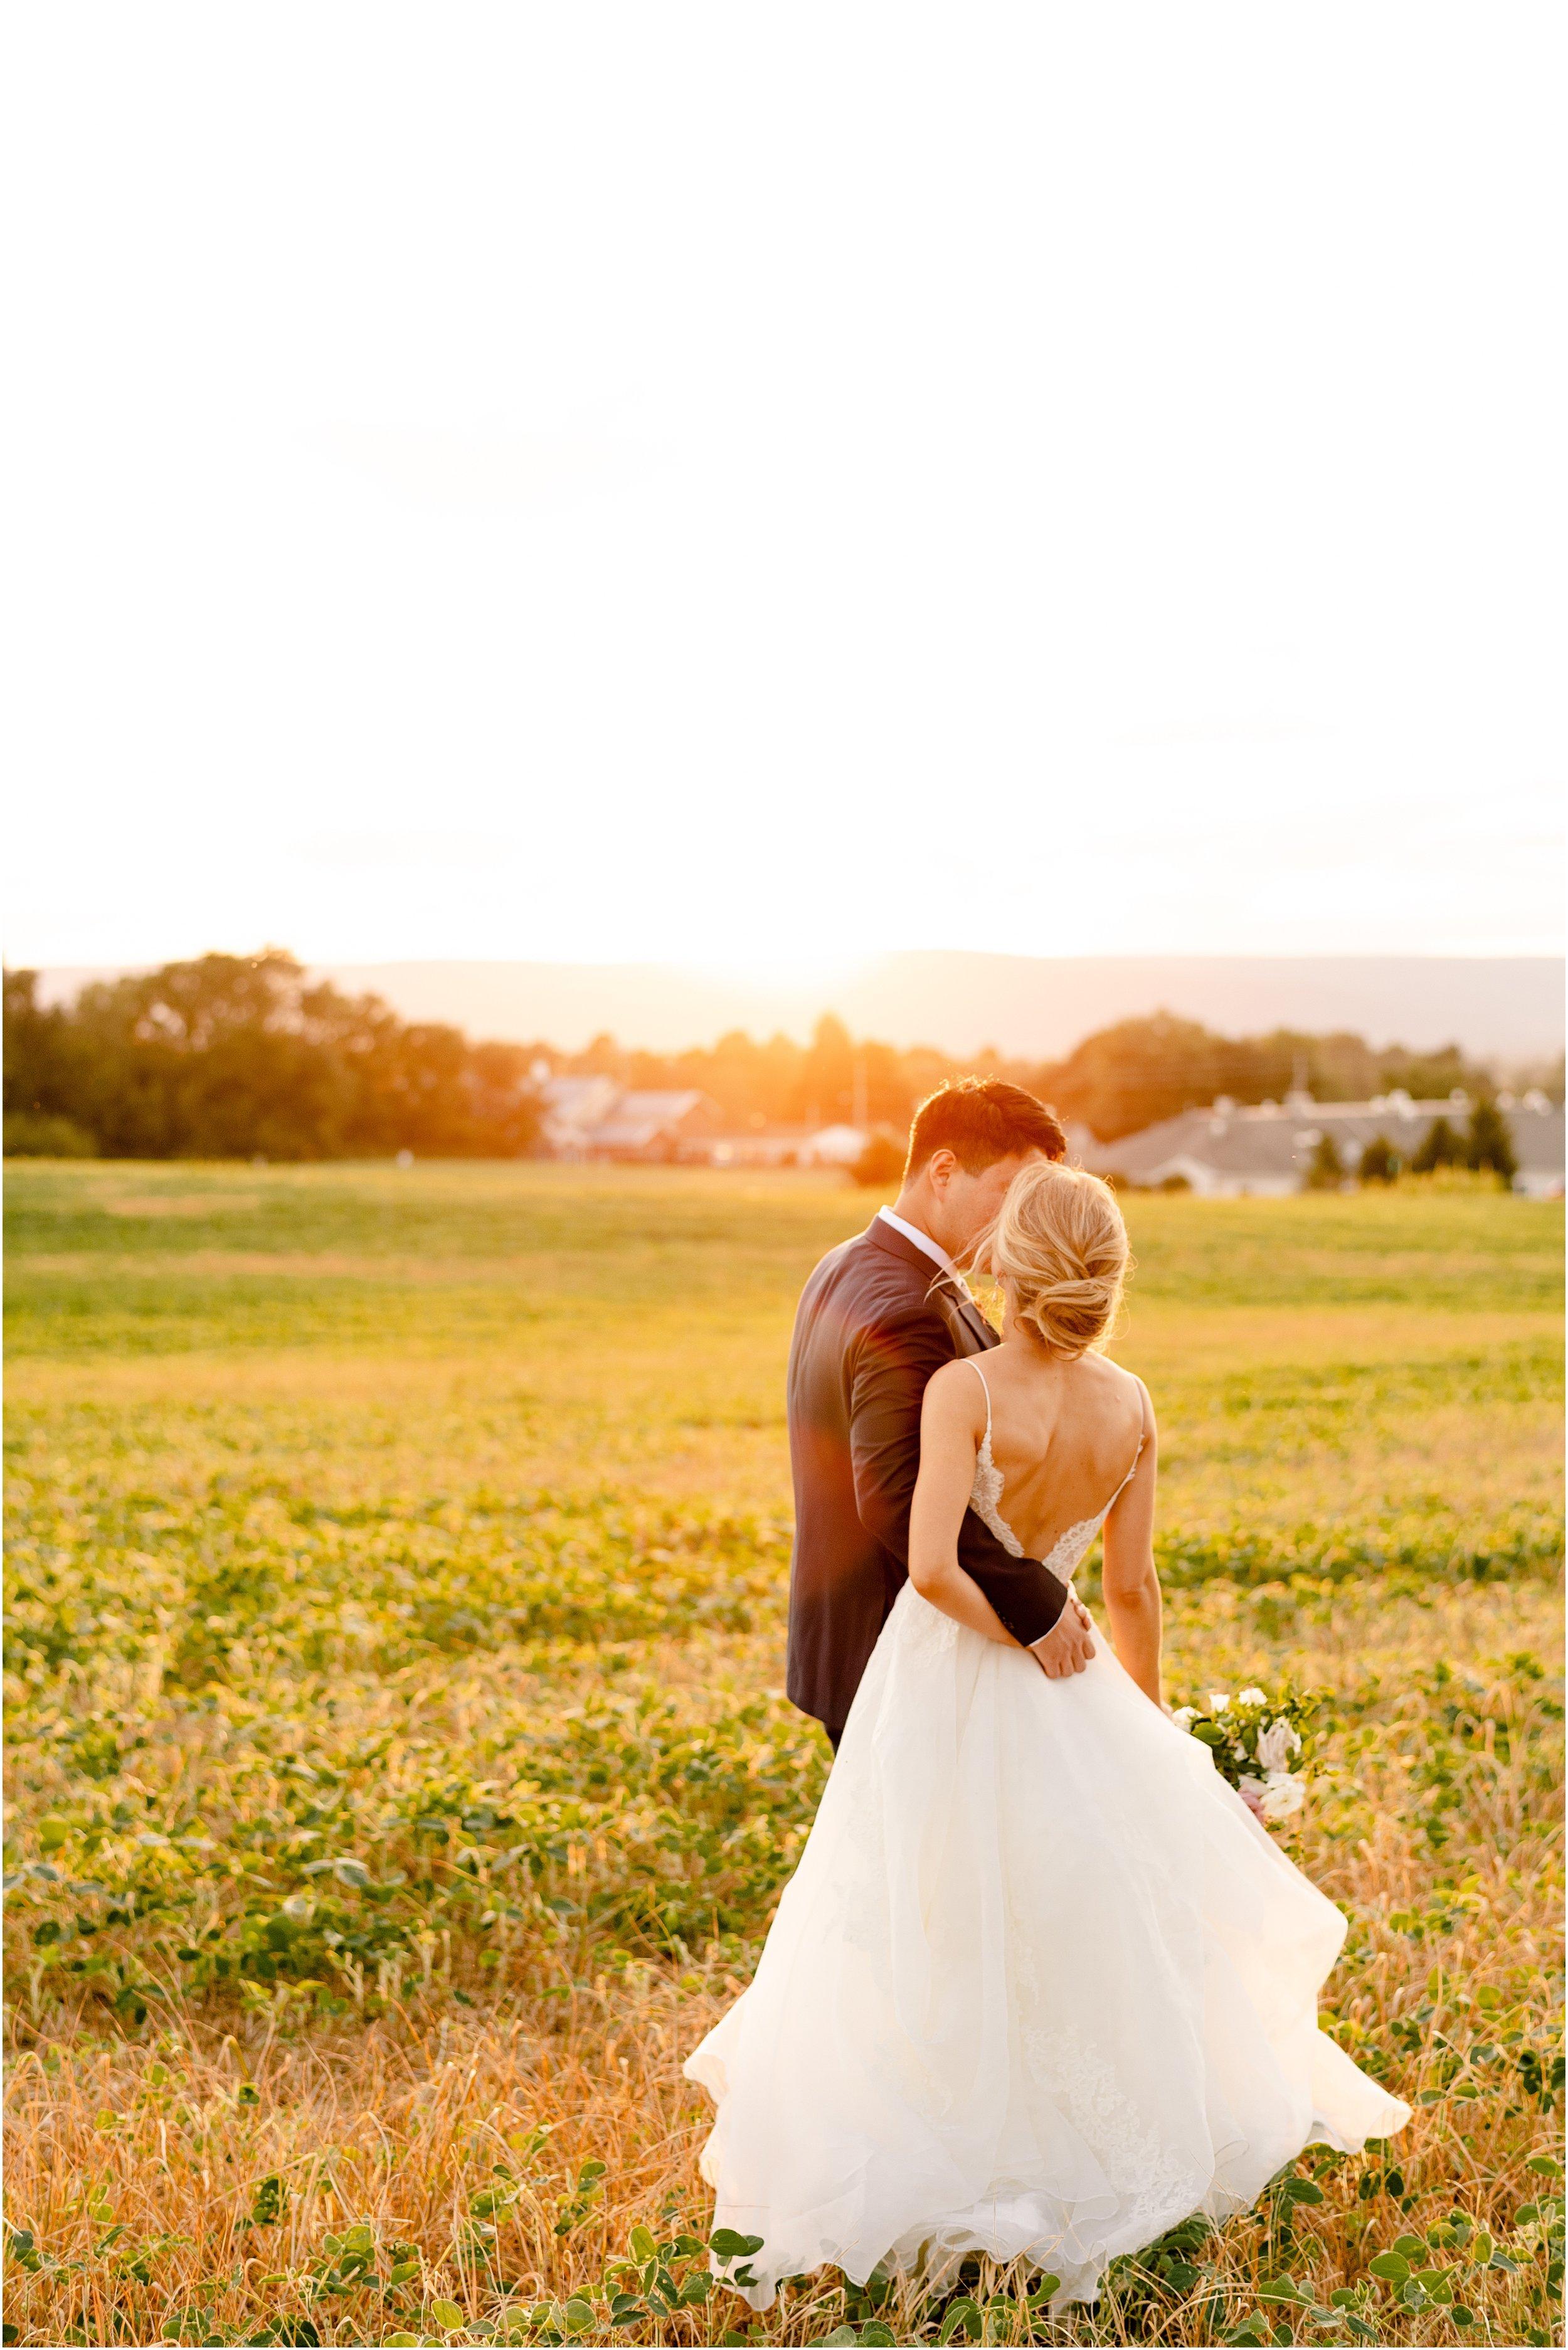 hannah leigh photography Walkers Overlook Wedding Walkersville MD_3559.jpg